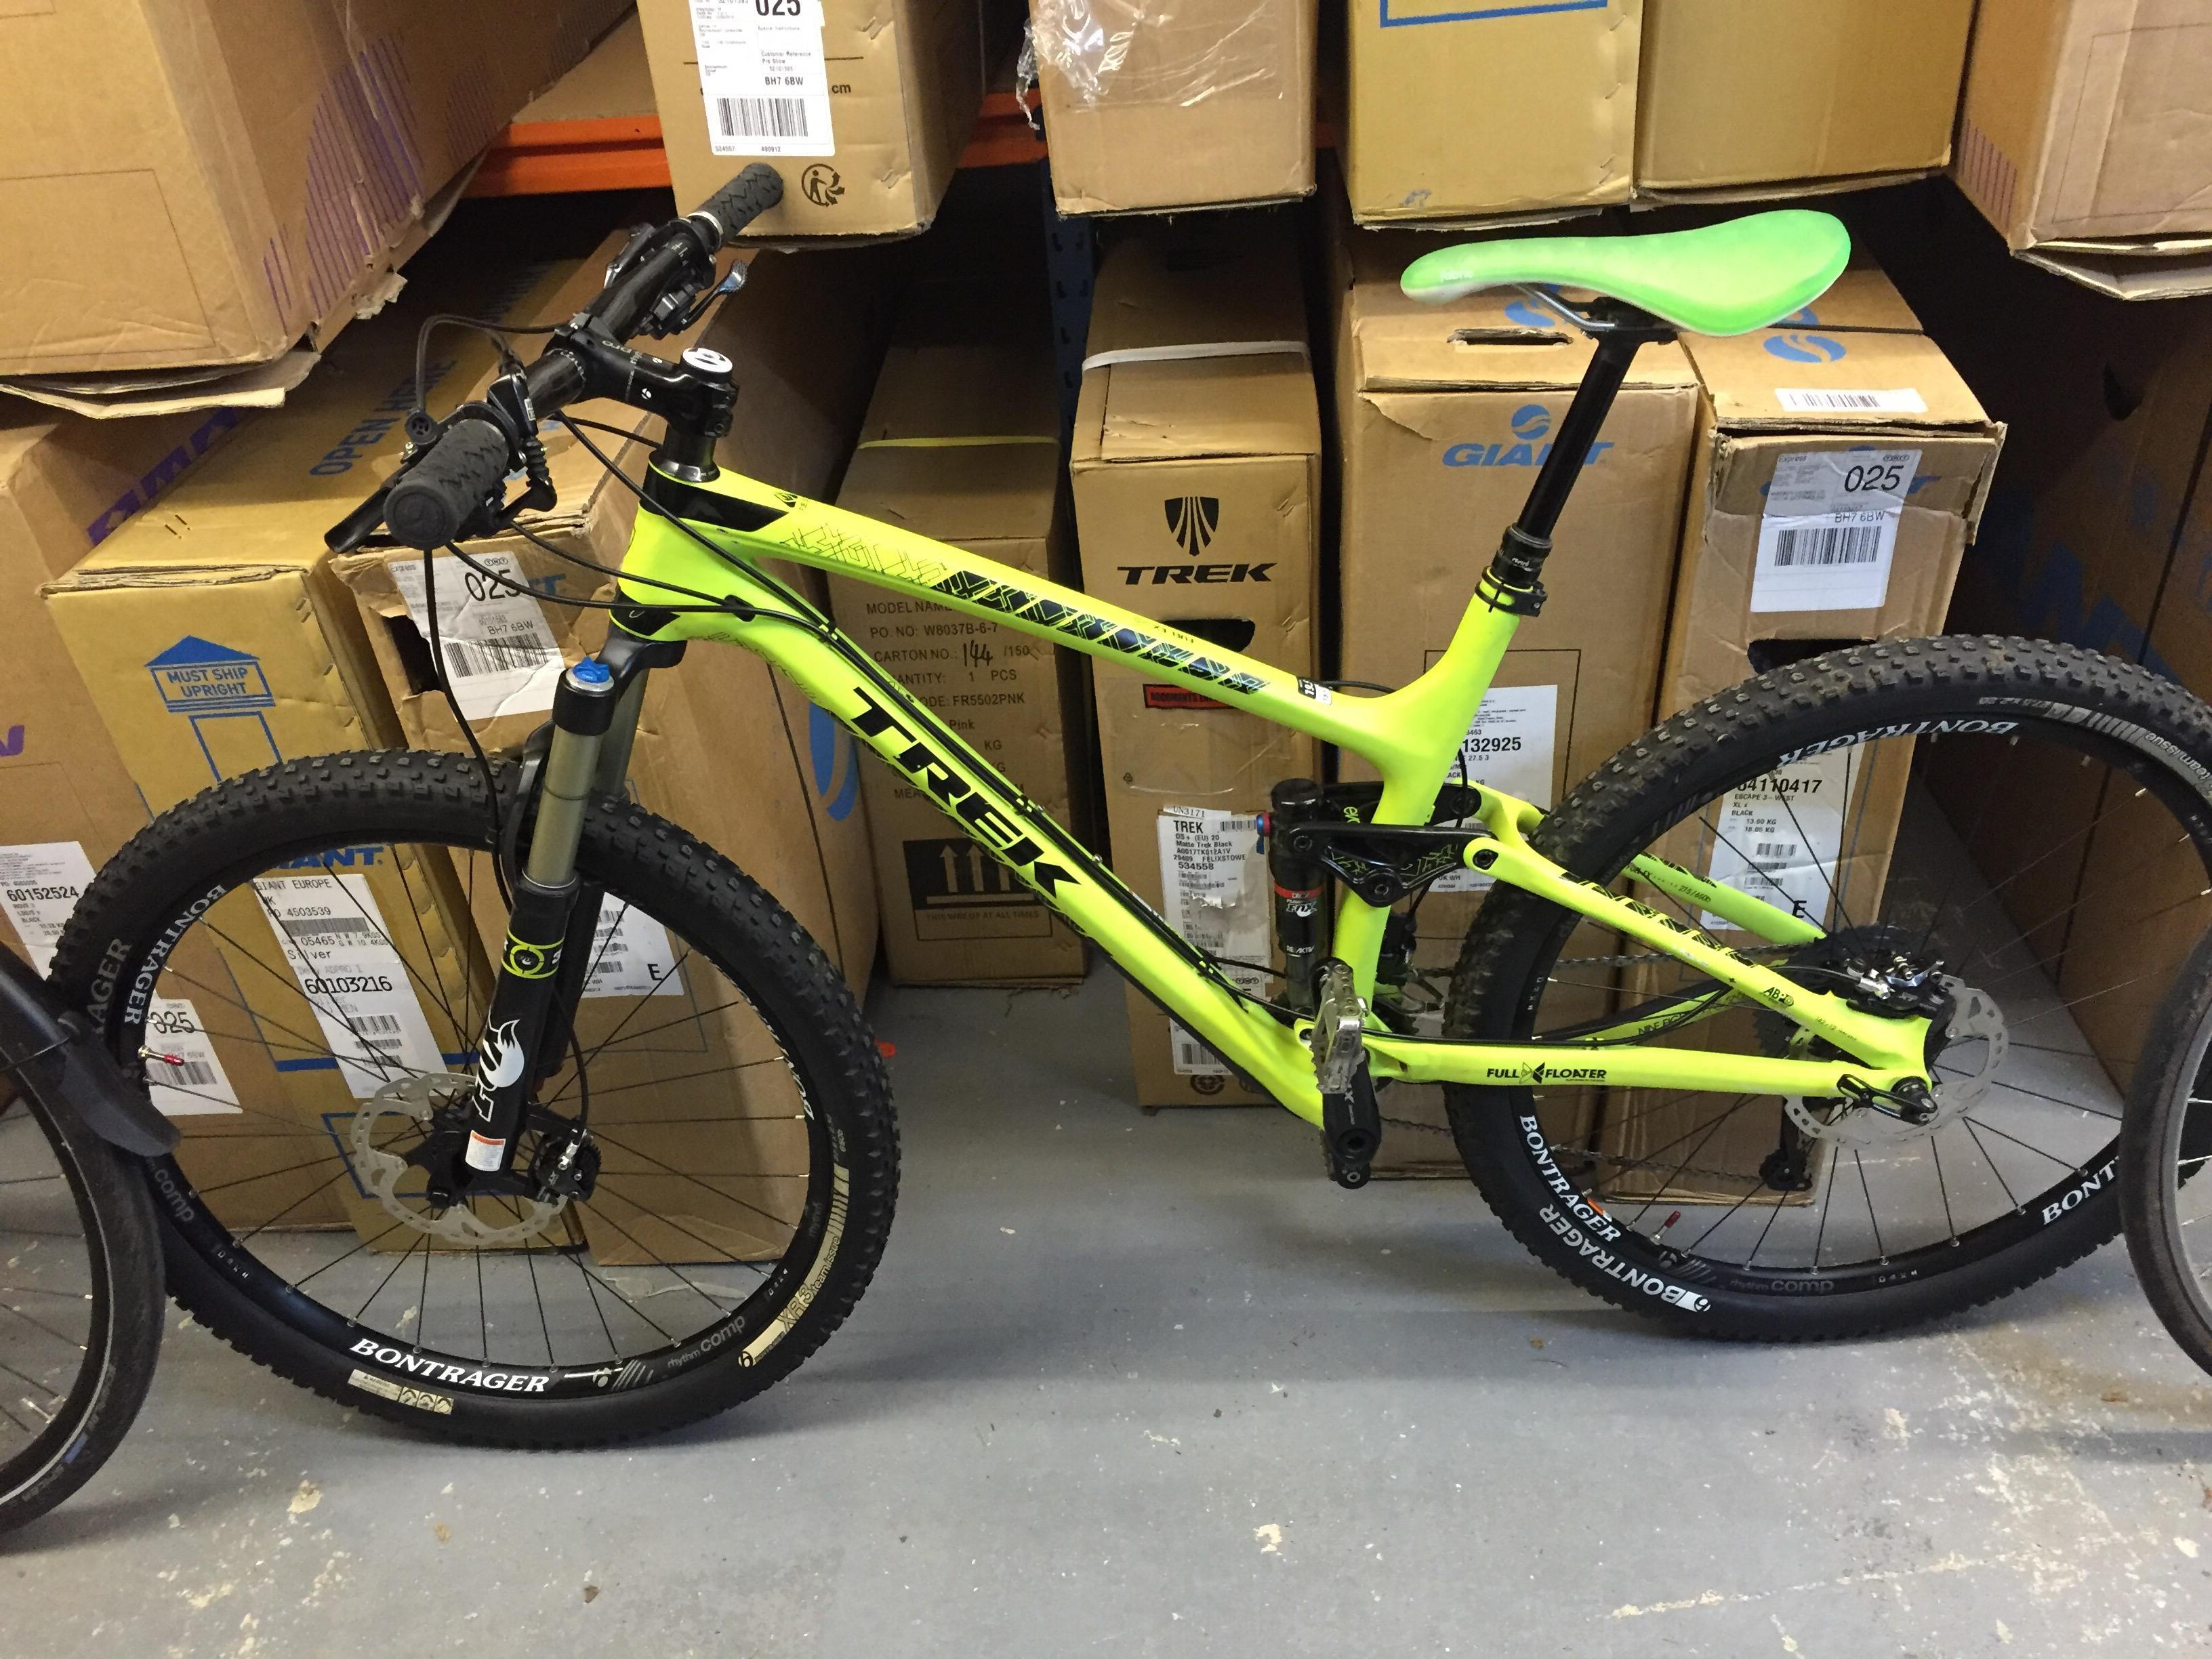 afc21d9cf4b SOLD - Ex Demo Bike - Trek Fuel Ex 9.8 27.5 2015 - 19.5 inch - £2200